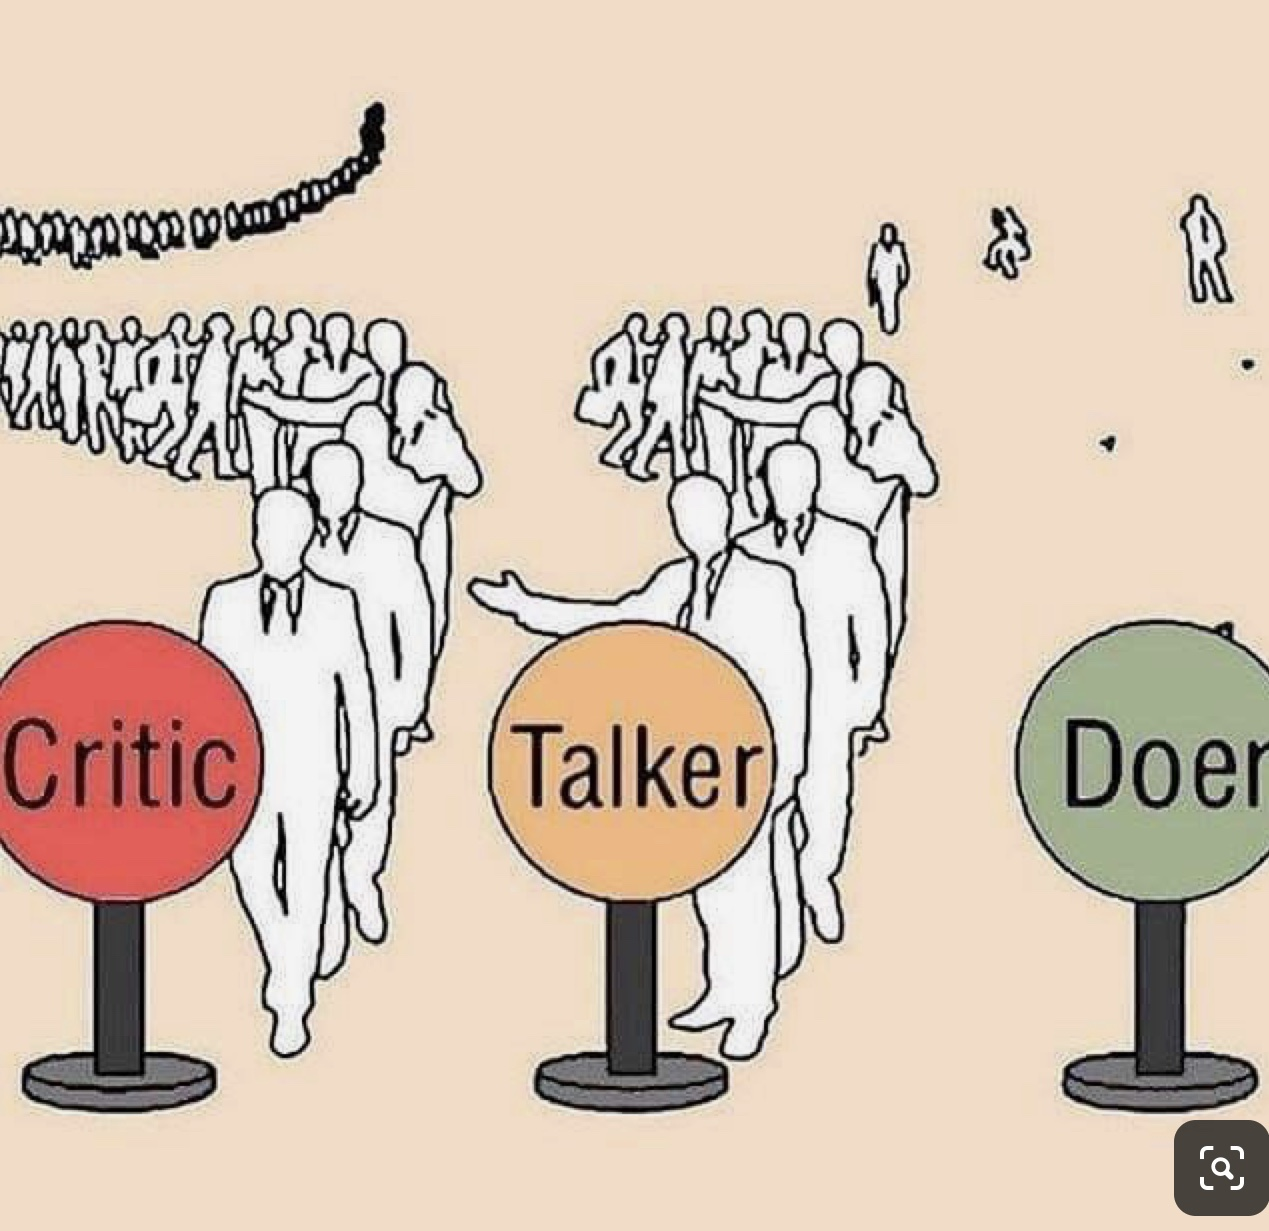 Critic Talker Doer